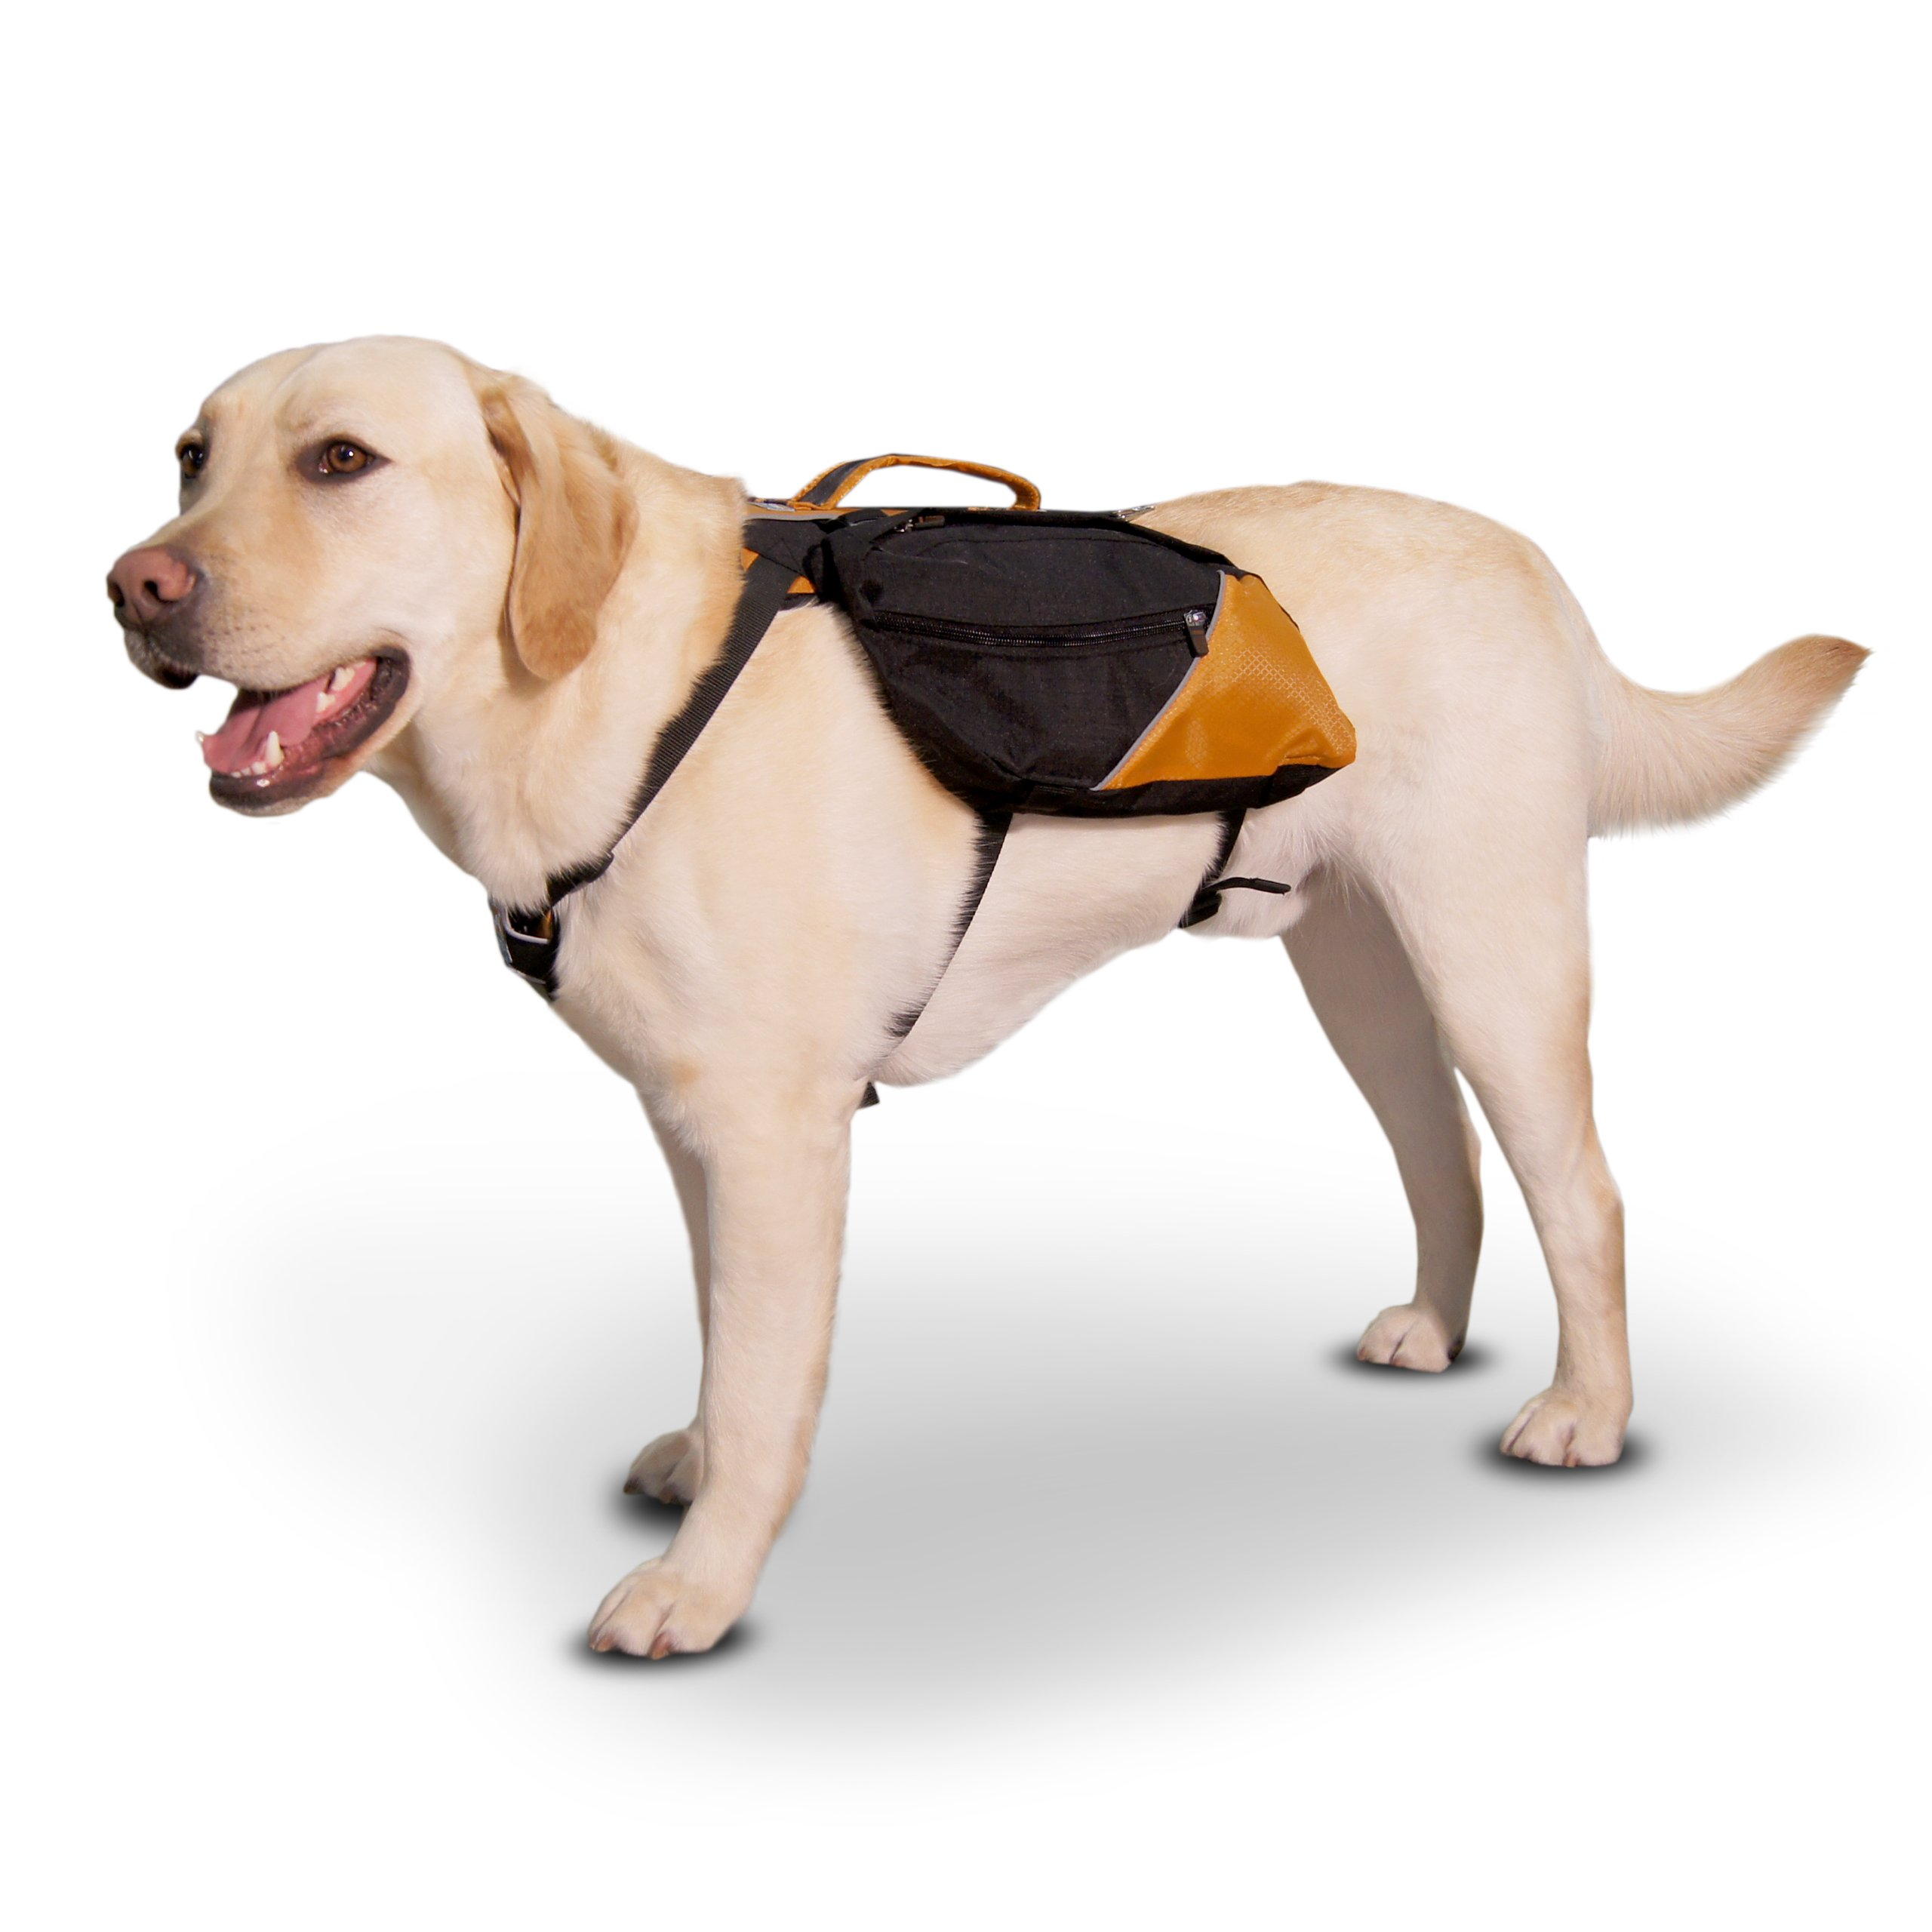 Kurgo Baxter (TM) Dog Backpack for Hiking, Walking or Camping, Black / Orange